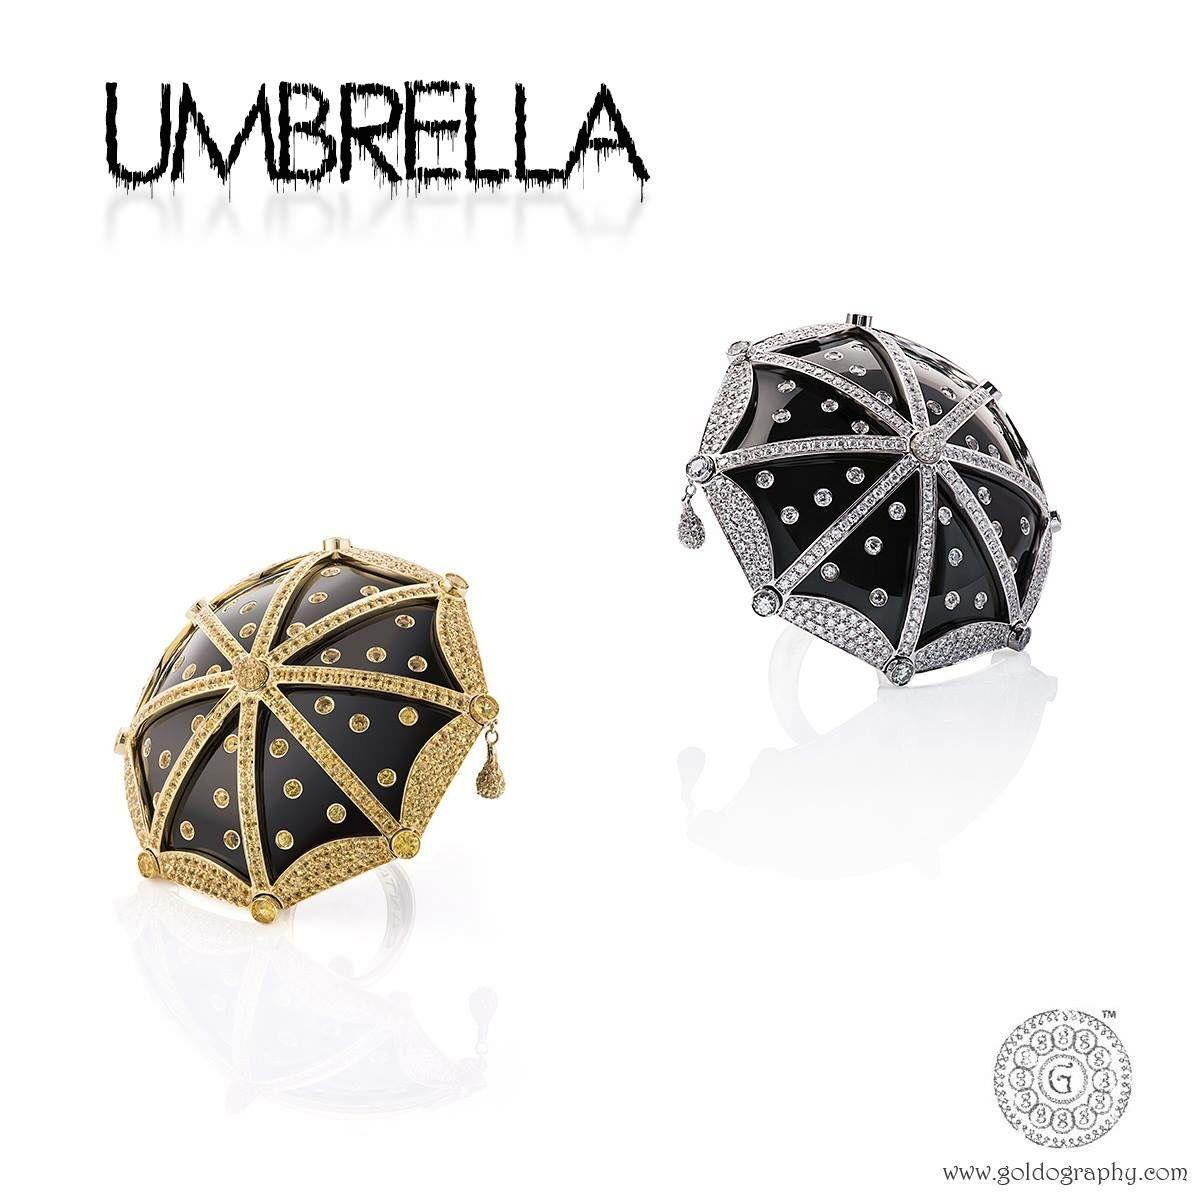 Umbrella! #Cantamessa, #Umbrella, #Rings, #18K, #Gold, #Diamonds, #Sapphires, #Onyx, #Jewelry, #Jewellery